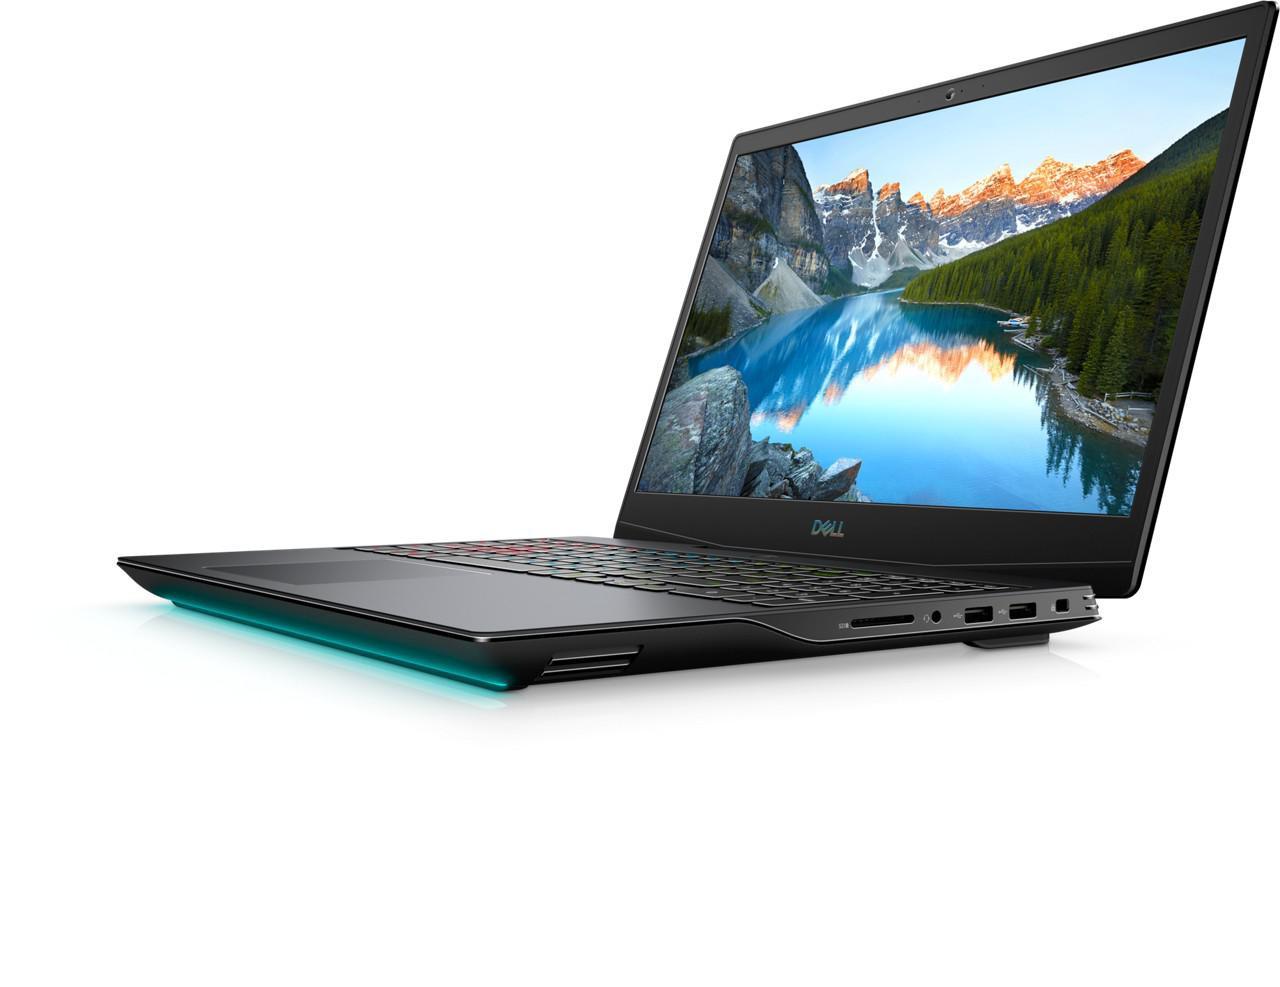 "Laptop Dell Inspiron Gaming 5500 G5, 15.6"" FHD, i7-10750H, 16GB, 1TB SSD, GeForce RTX 2070, Ubuntu - imaginea 8"